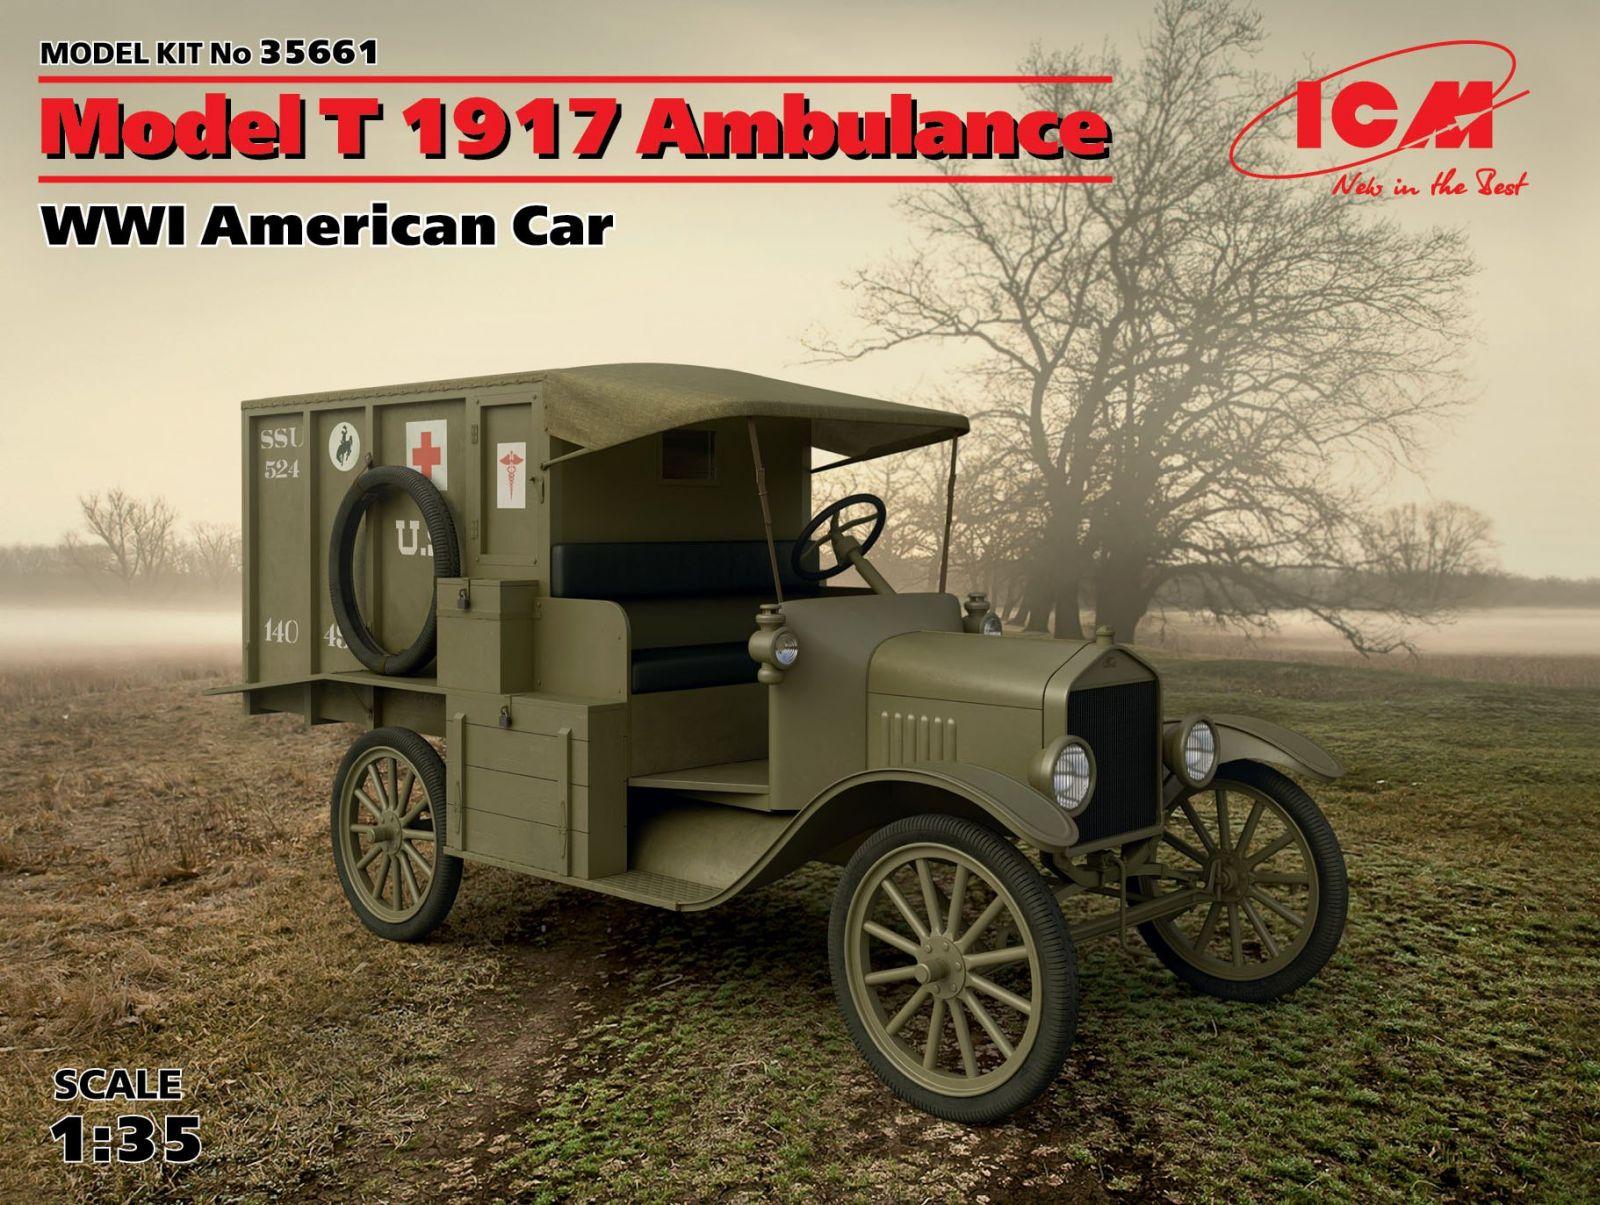 1-35-model-t-1917-ambulance-0.jpg.big.jpg